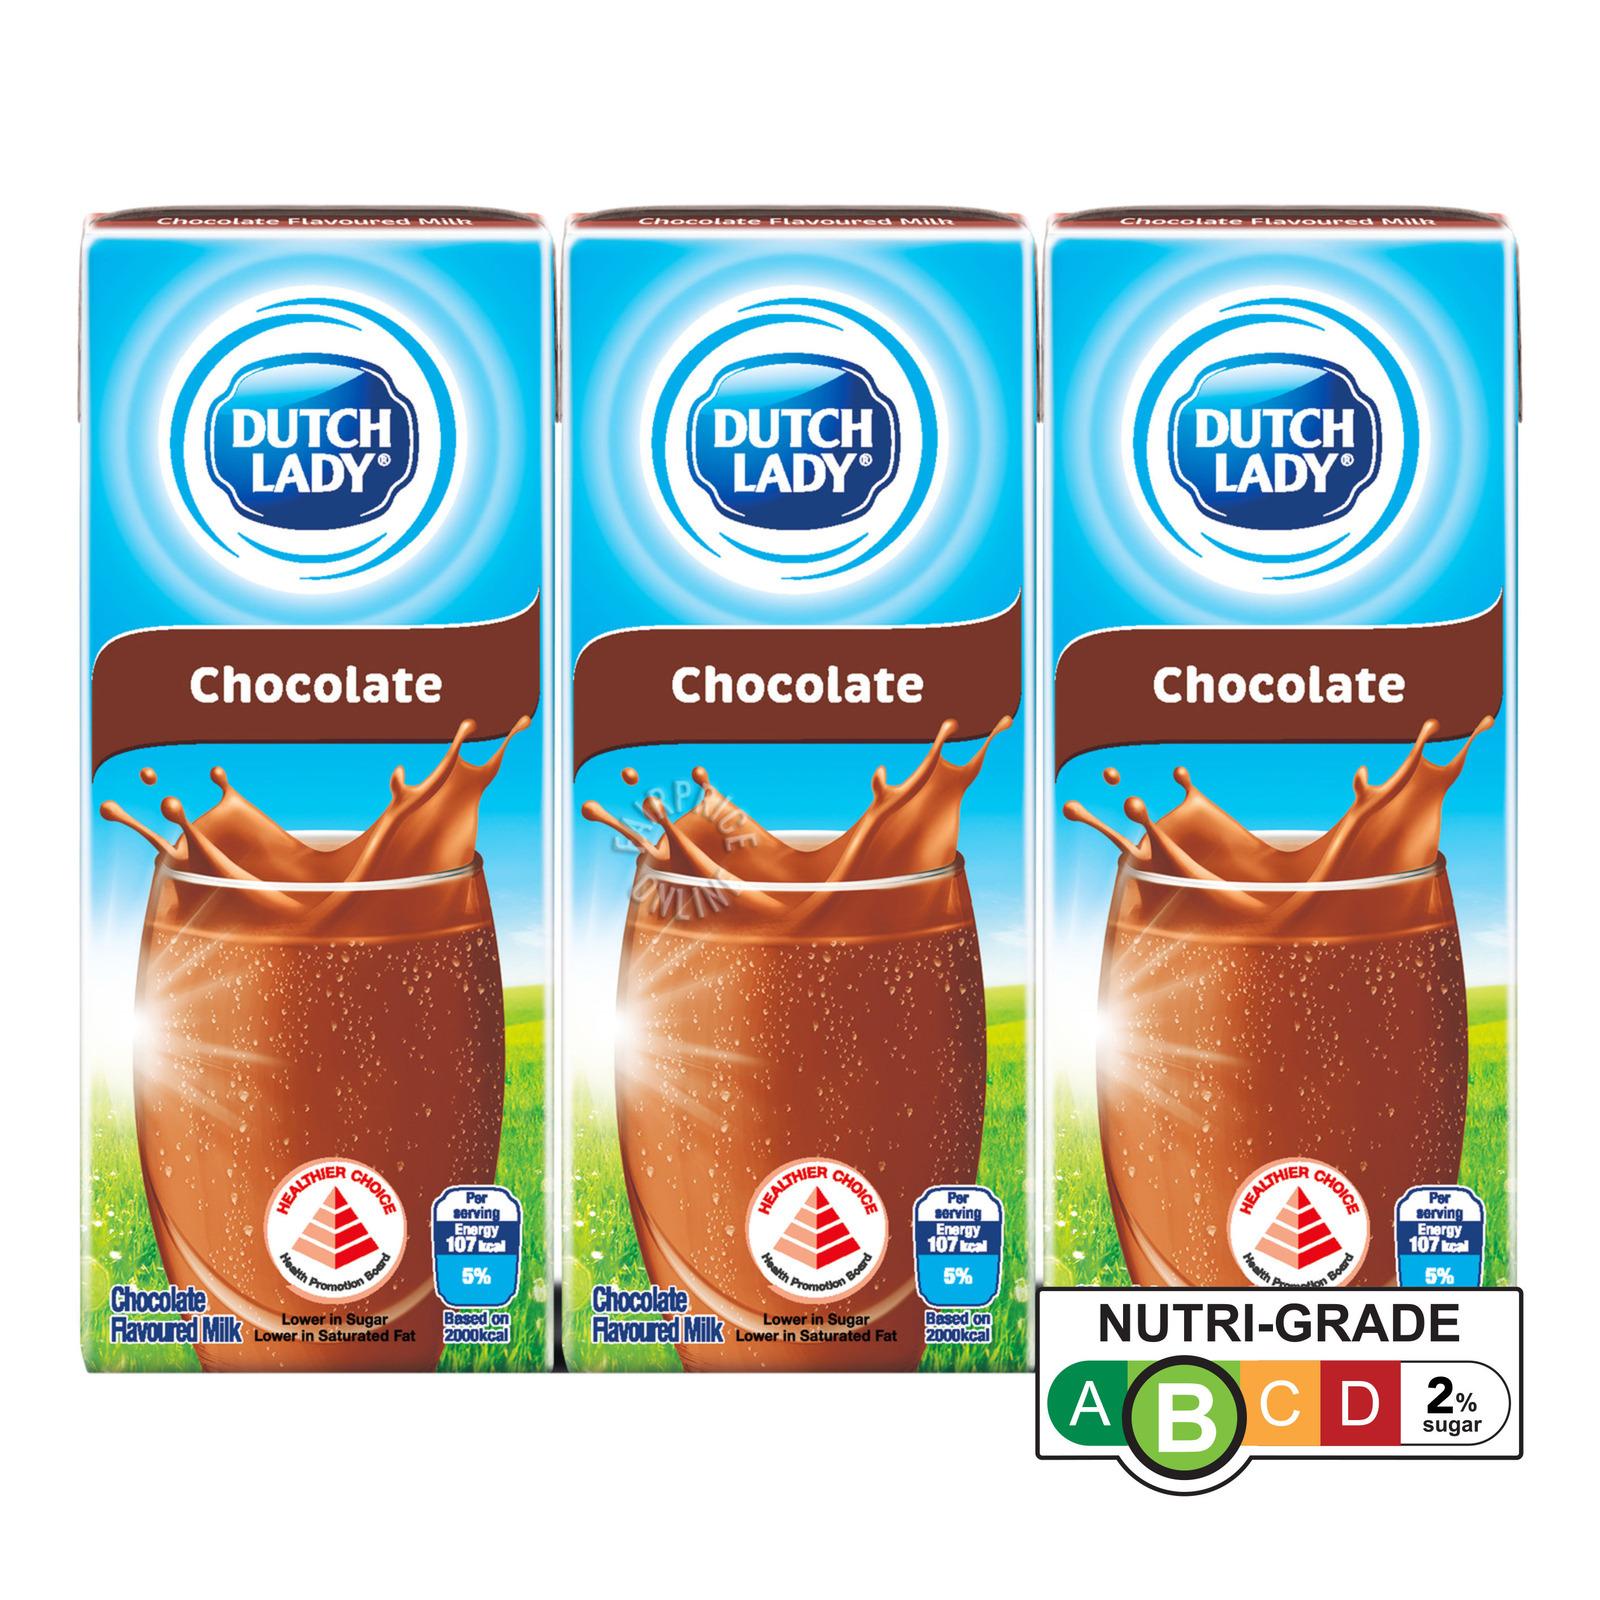 Dutch Lady Pure Farm UHT Flavoured Milk - Chocolate